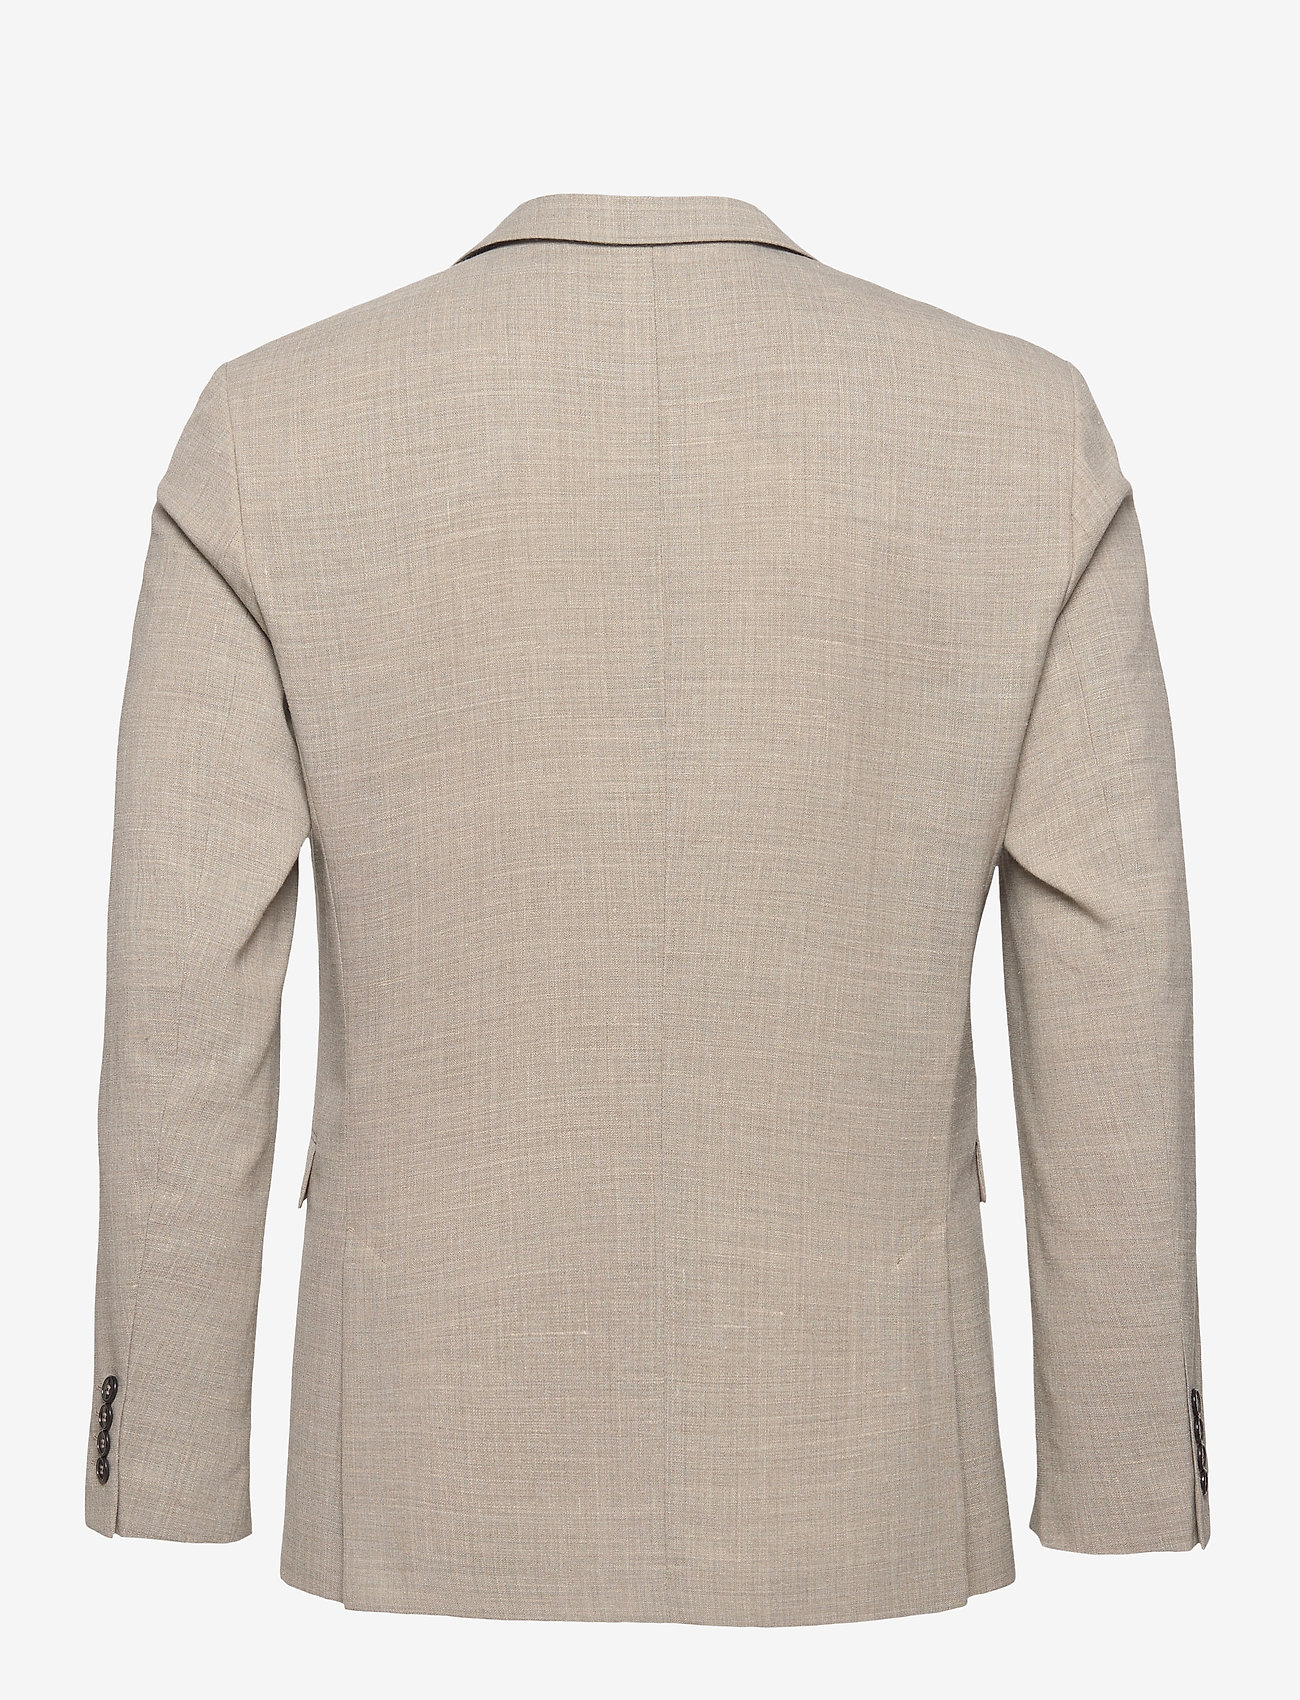 Selected Homme - SLHSLIM-OASIS LIGHT SANDLZ - single breasted blazers - sand - 1